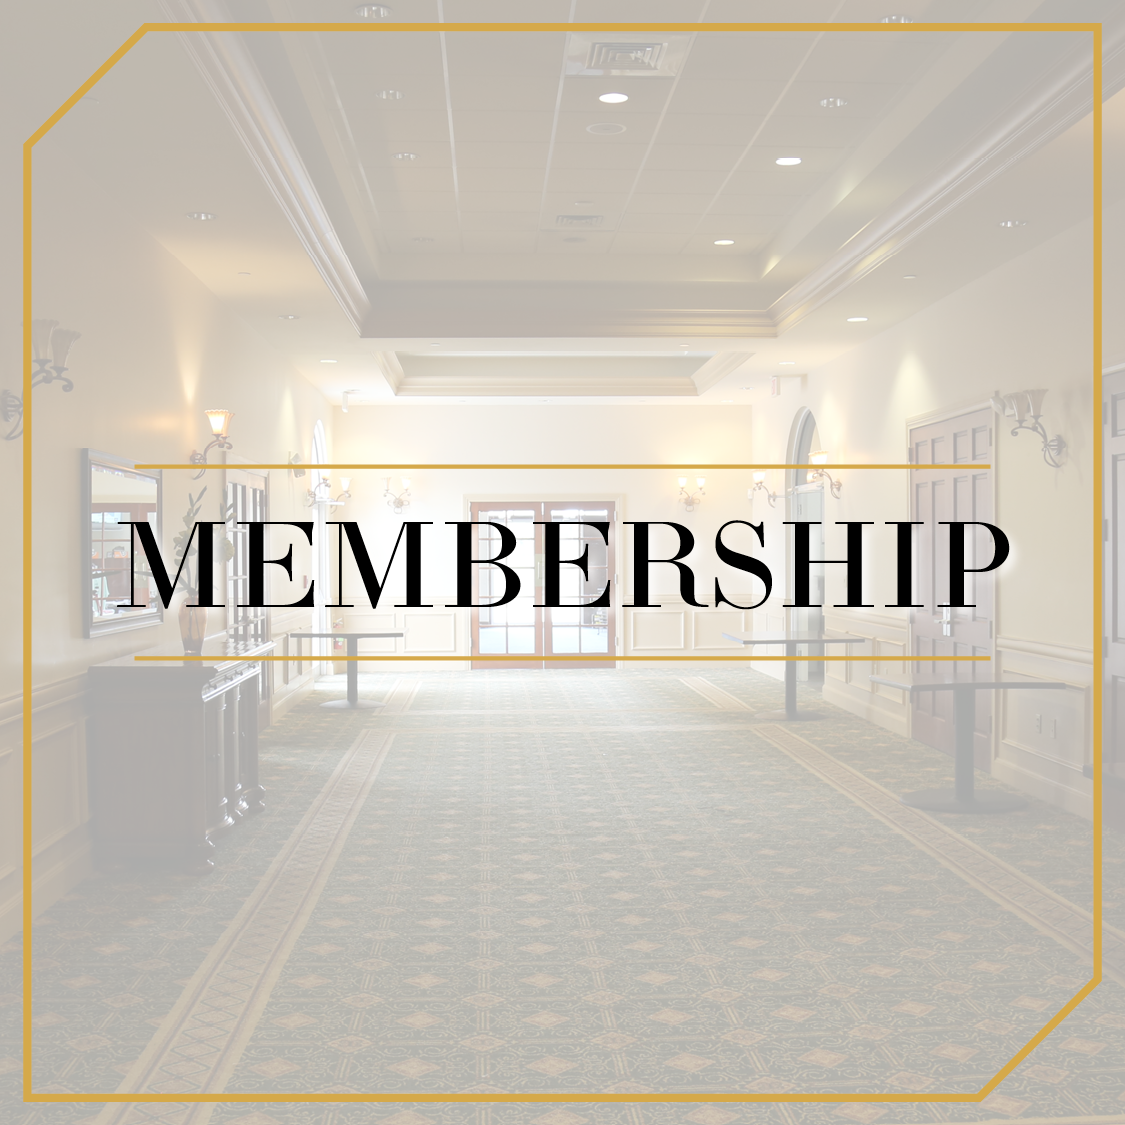 Wellington National - Membership.png